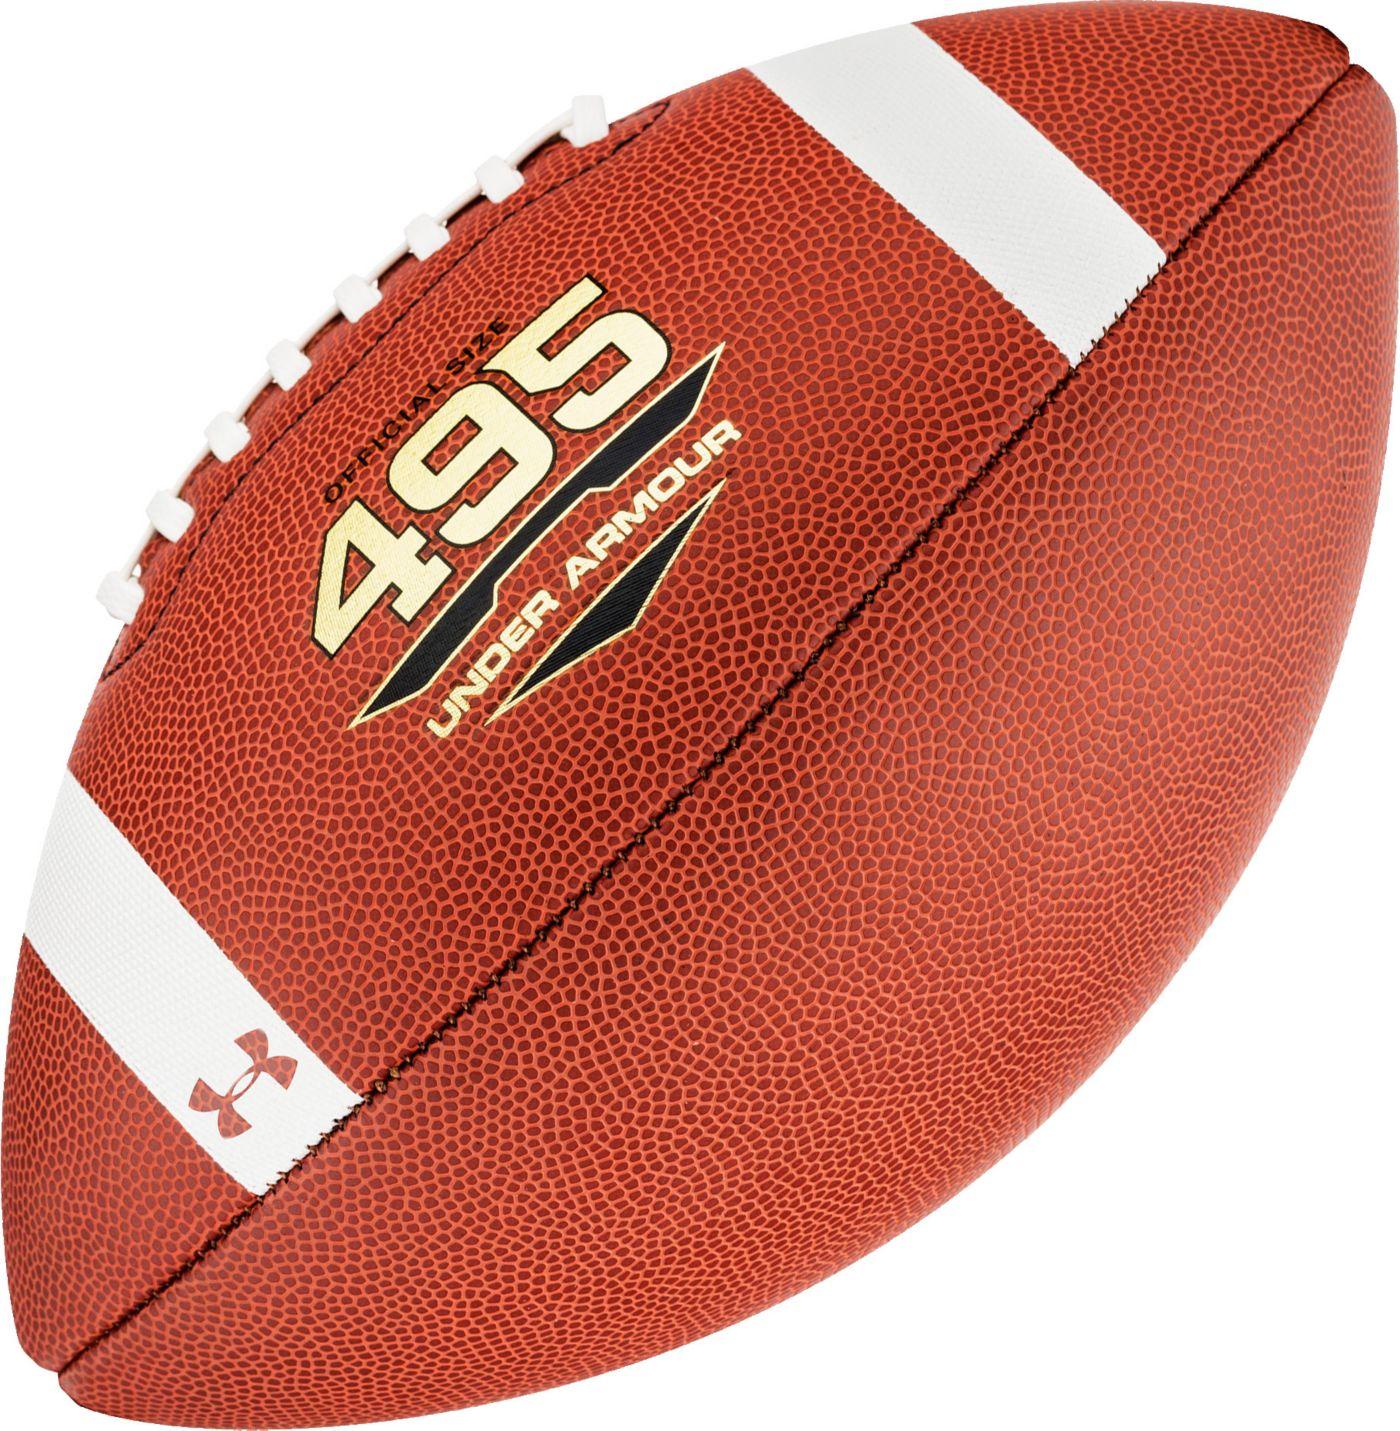 Under Armour 495 Composite Football